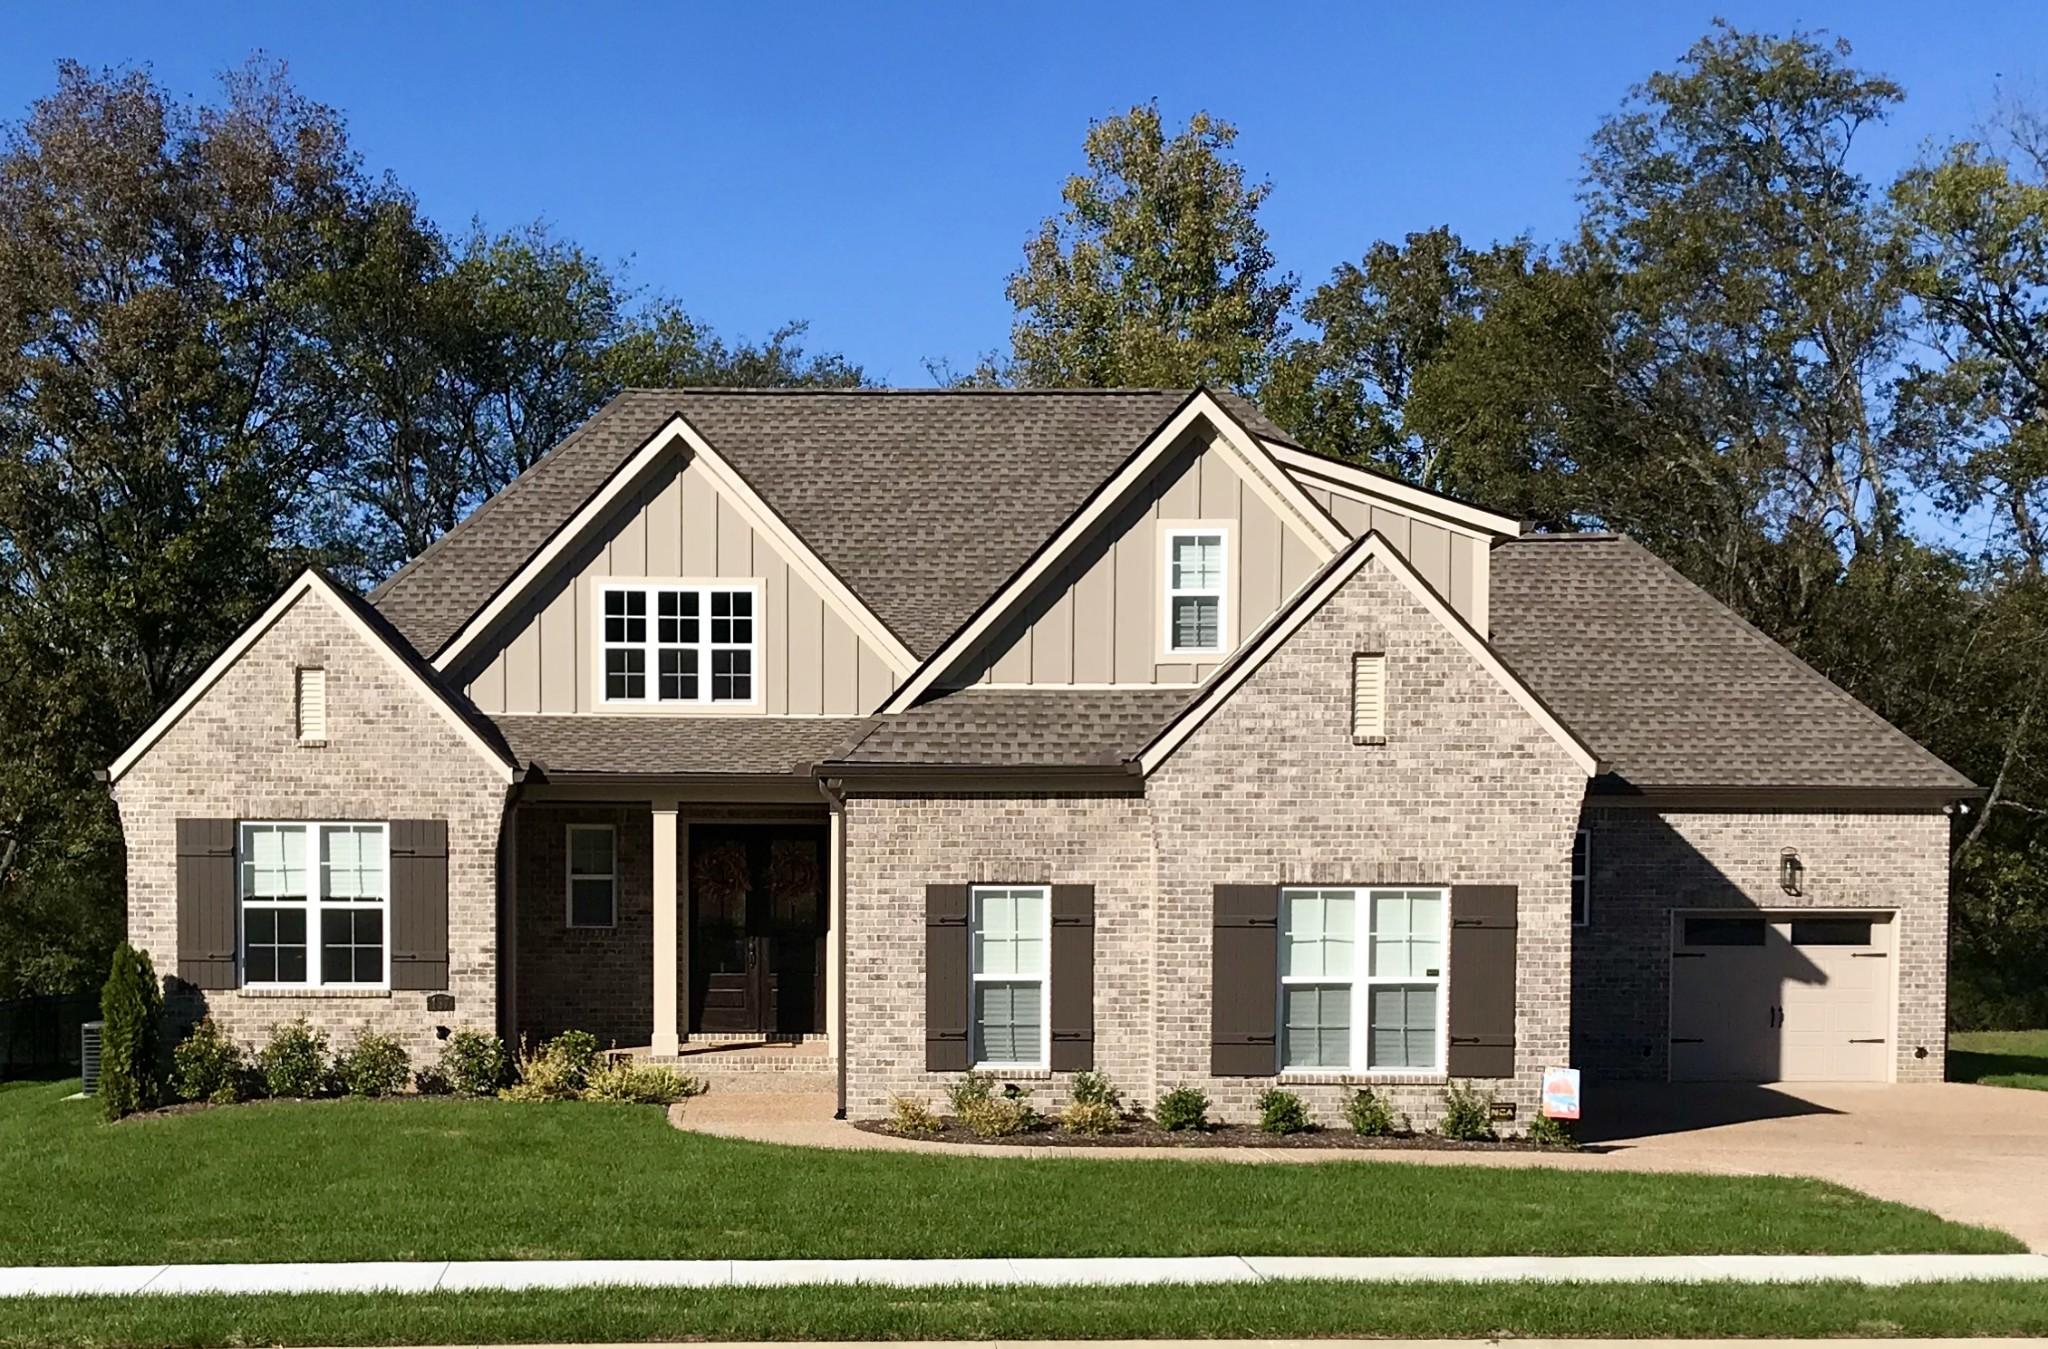 331 Wendling Blvd Property Photo - Gallatin, TN real estate listing